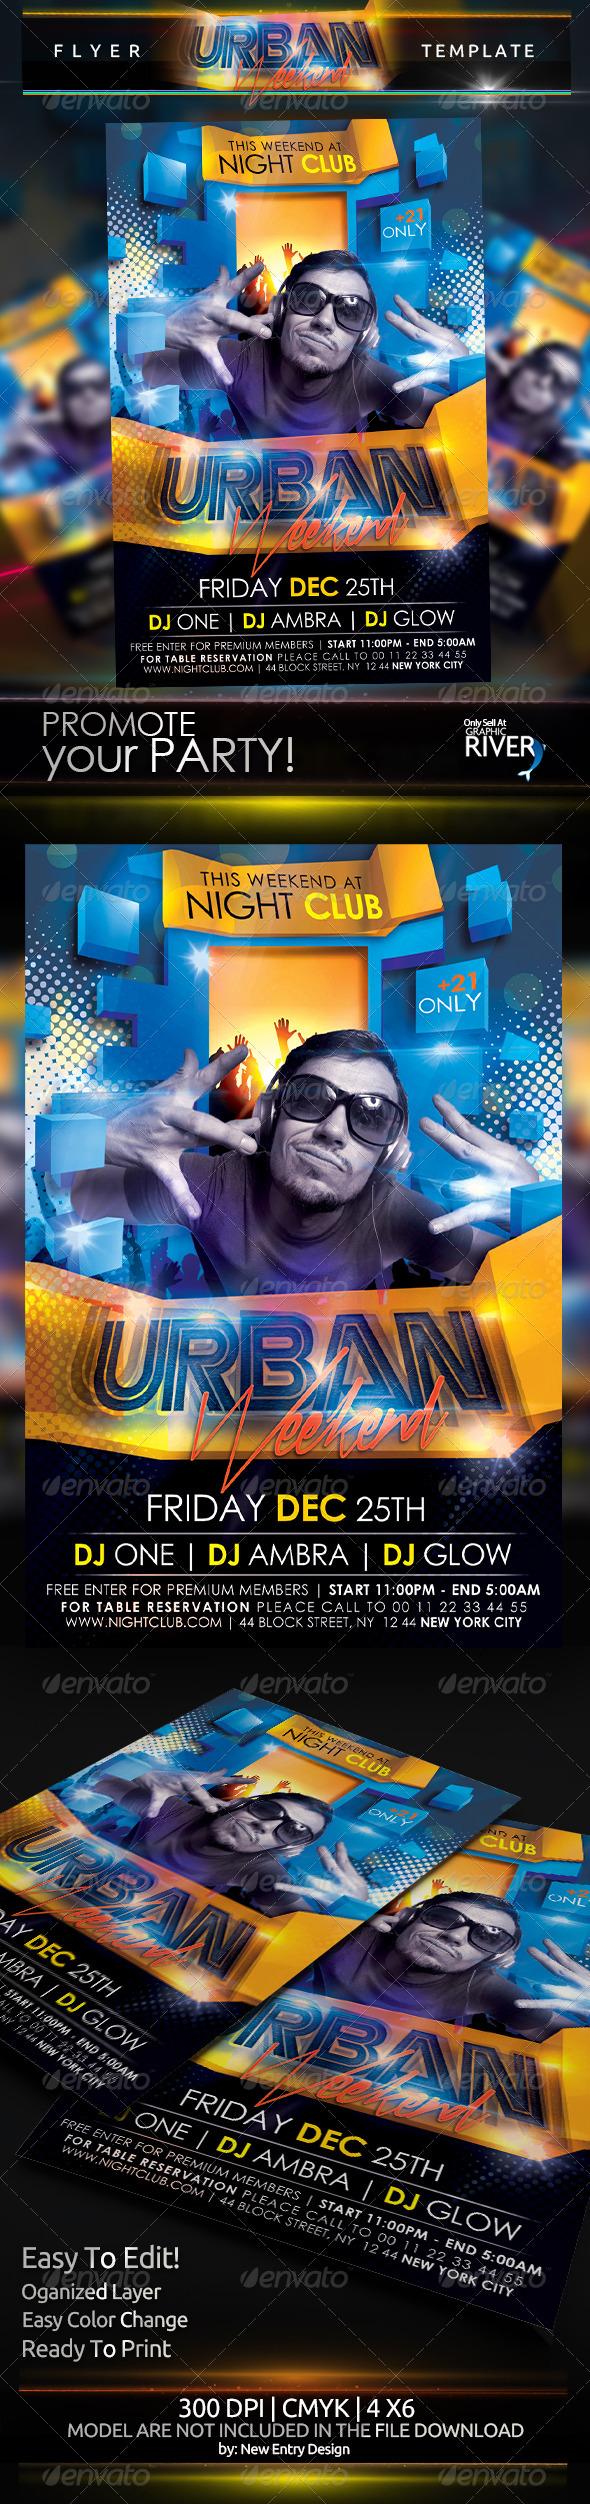 Urban Weekend Flyer Template